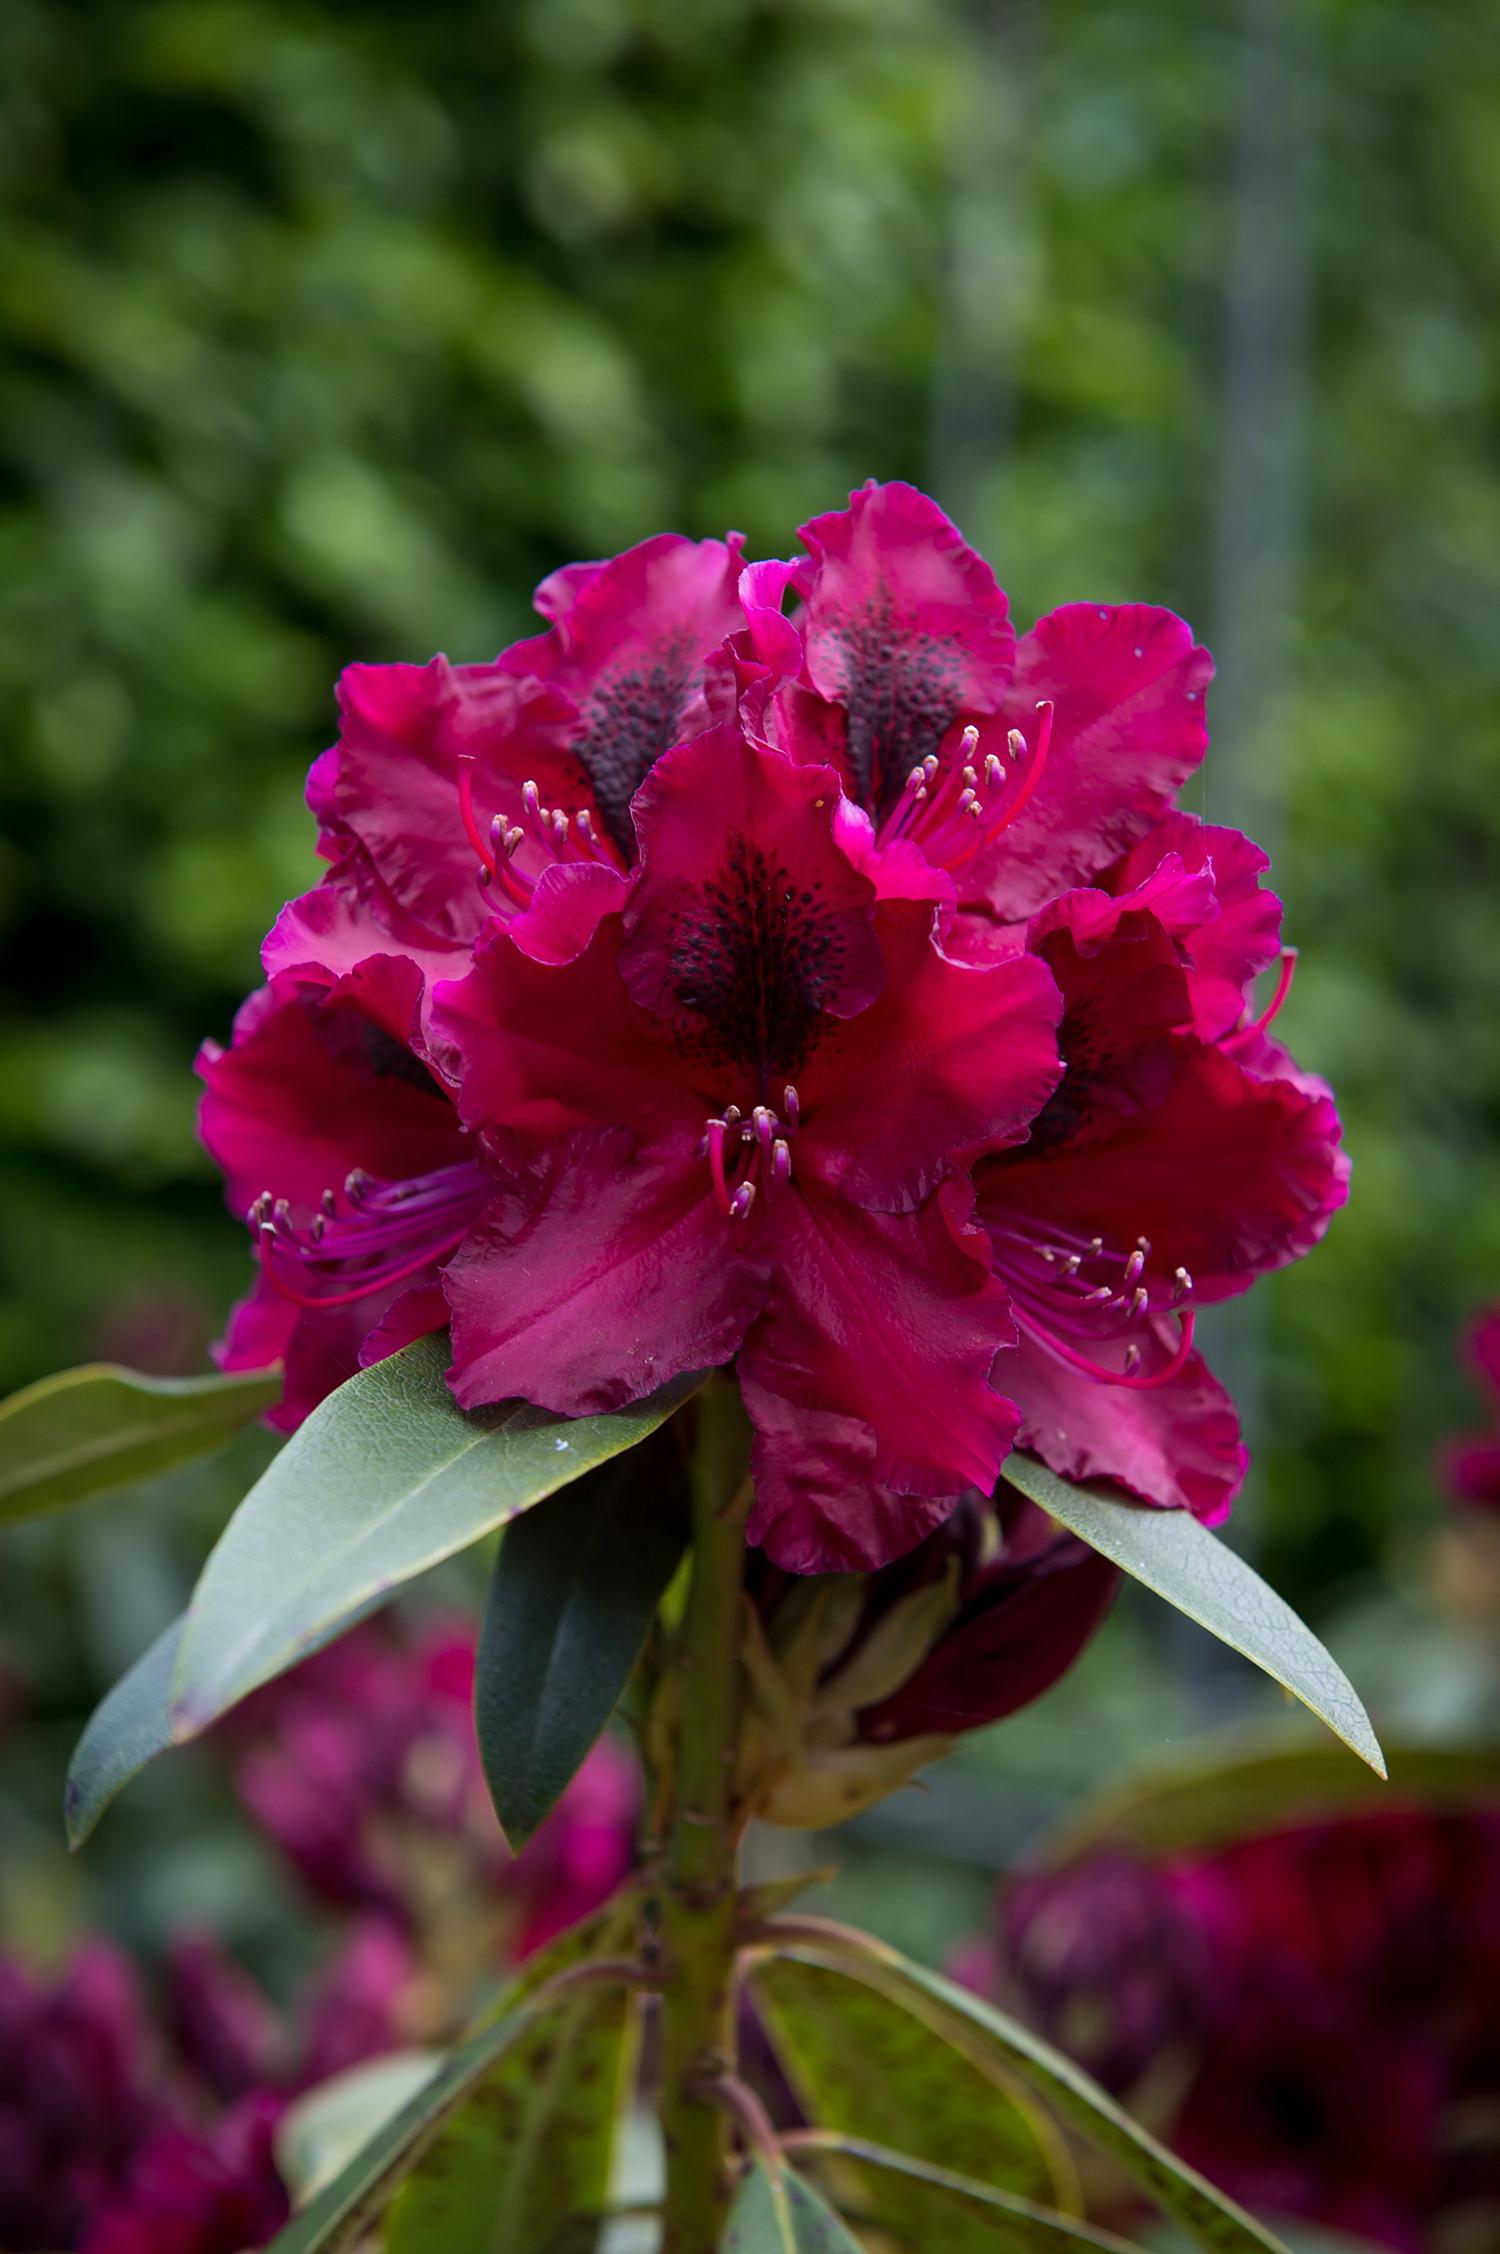 Atemberaubend Deutsche Rhododendron-Gesellschaft e.V. @PD_21